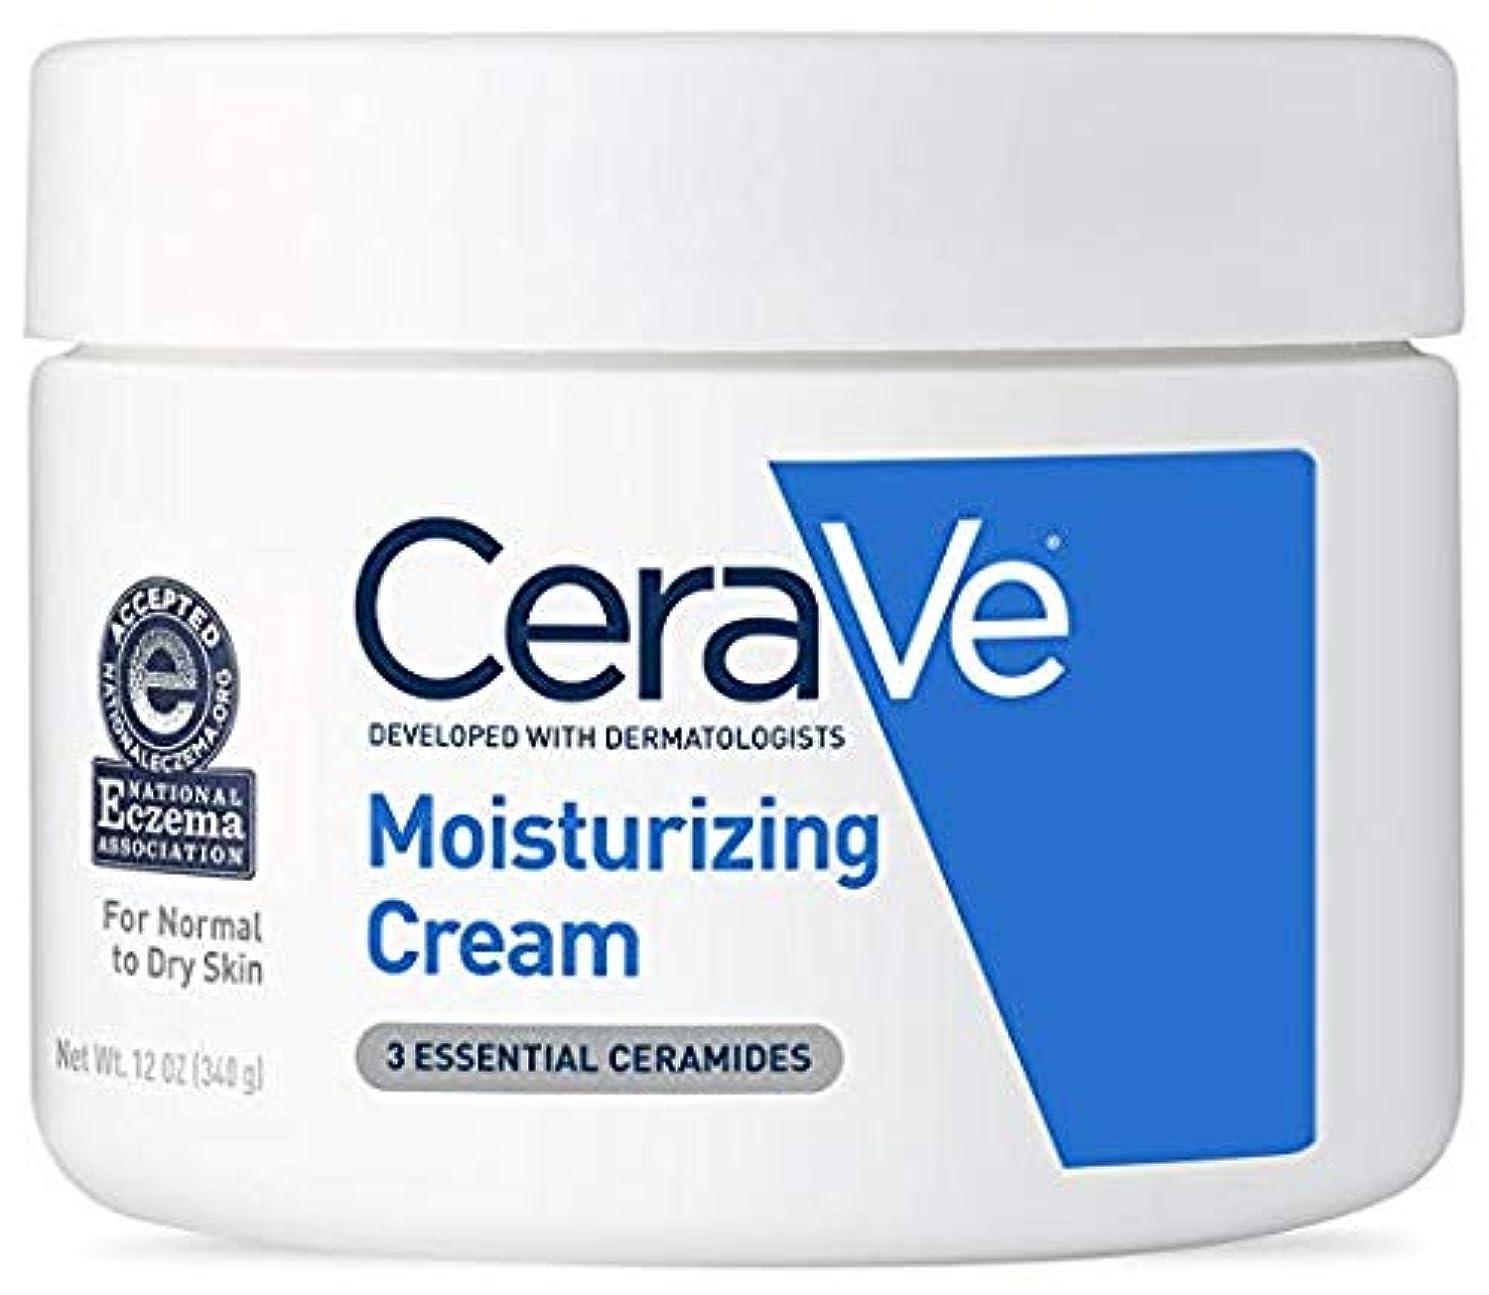 CeraVe (セラヴィ) モイスチャライジングクリーム CeraVe Moisturizing Cream Daily Face and Body Moisturizer for Dry Skin